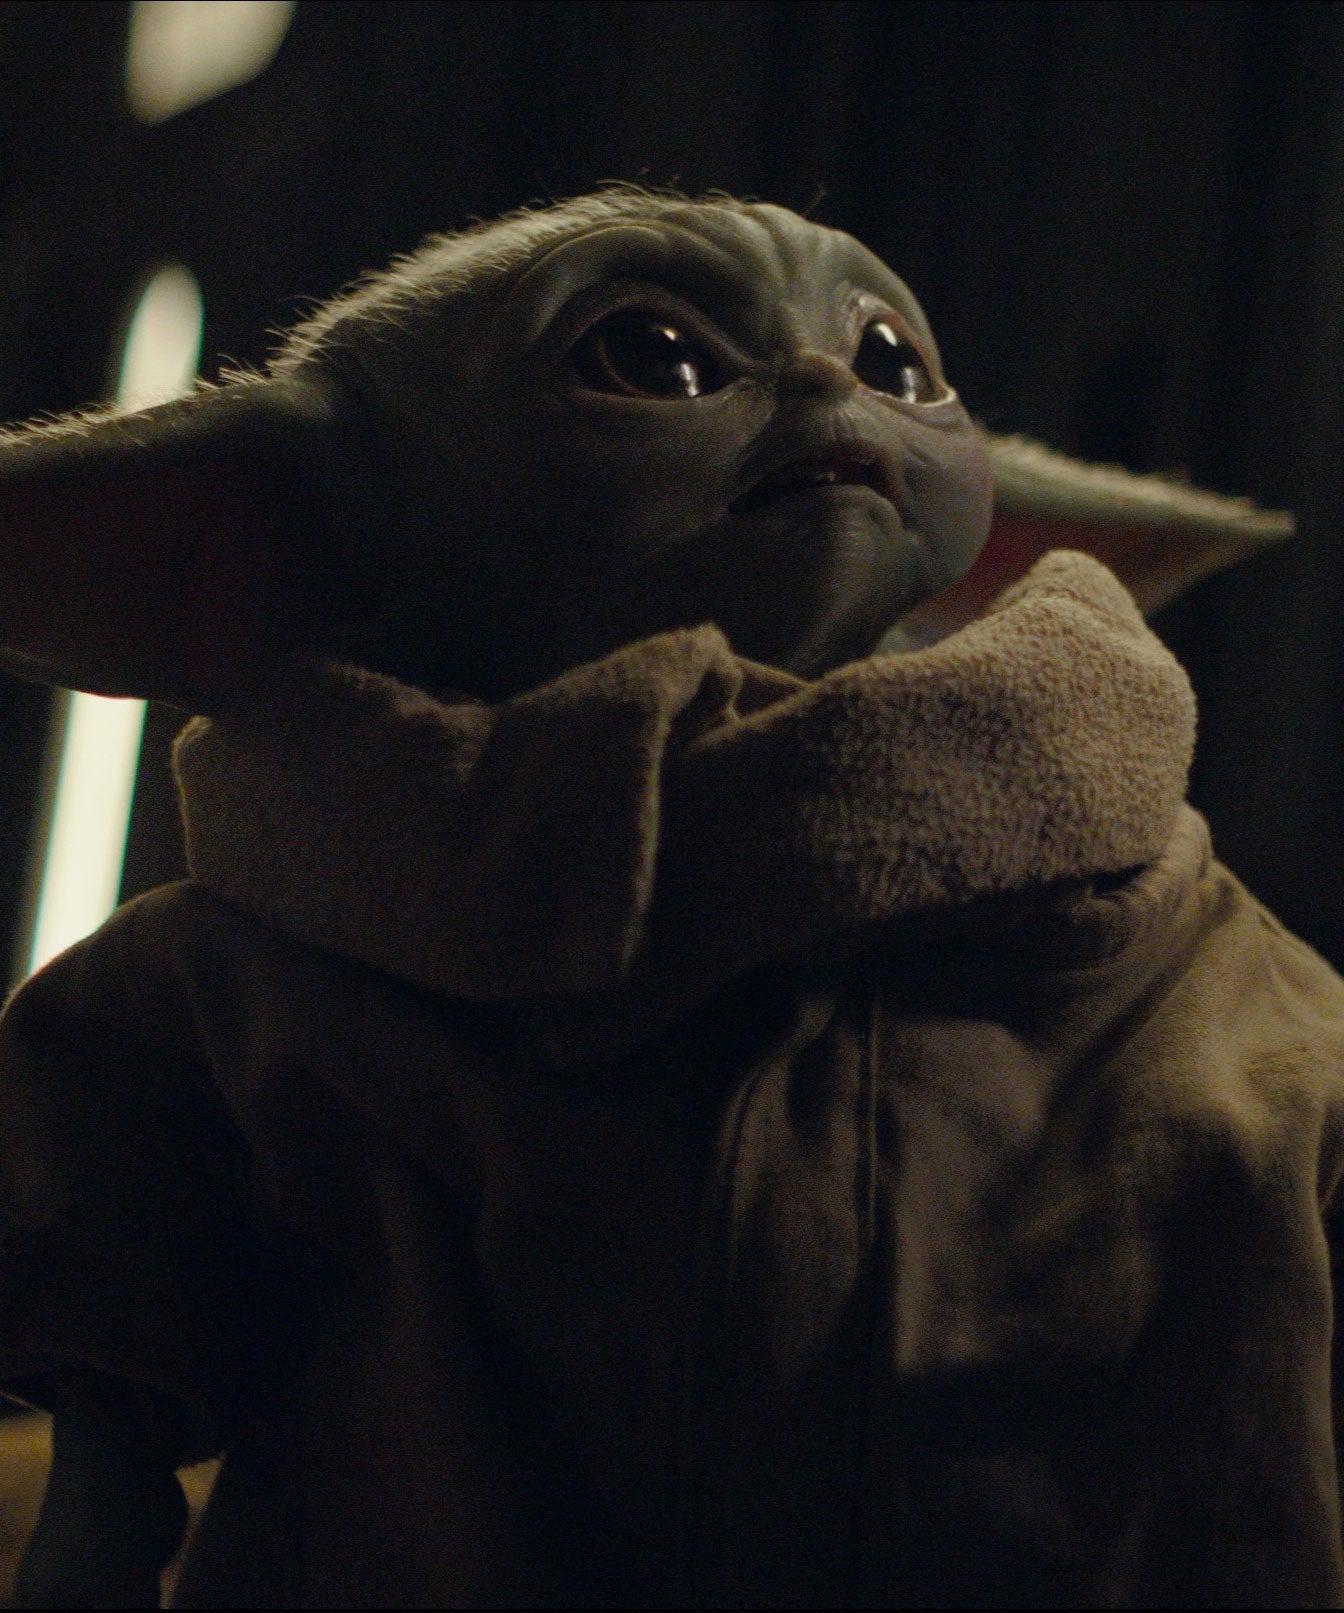 Baby Yoda Lion King : Mandalorian, Trailer, Here's